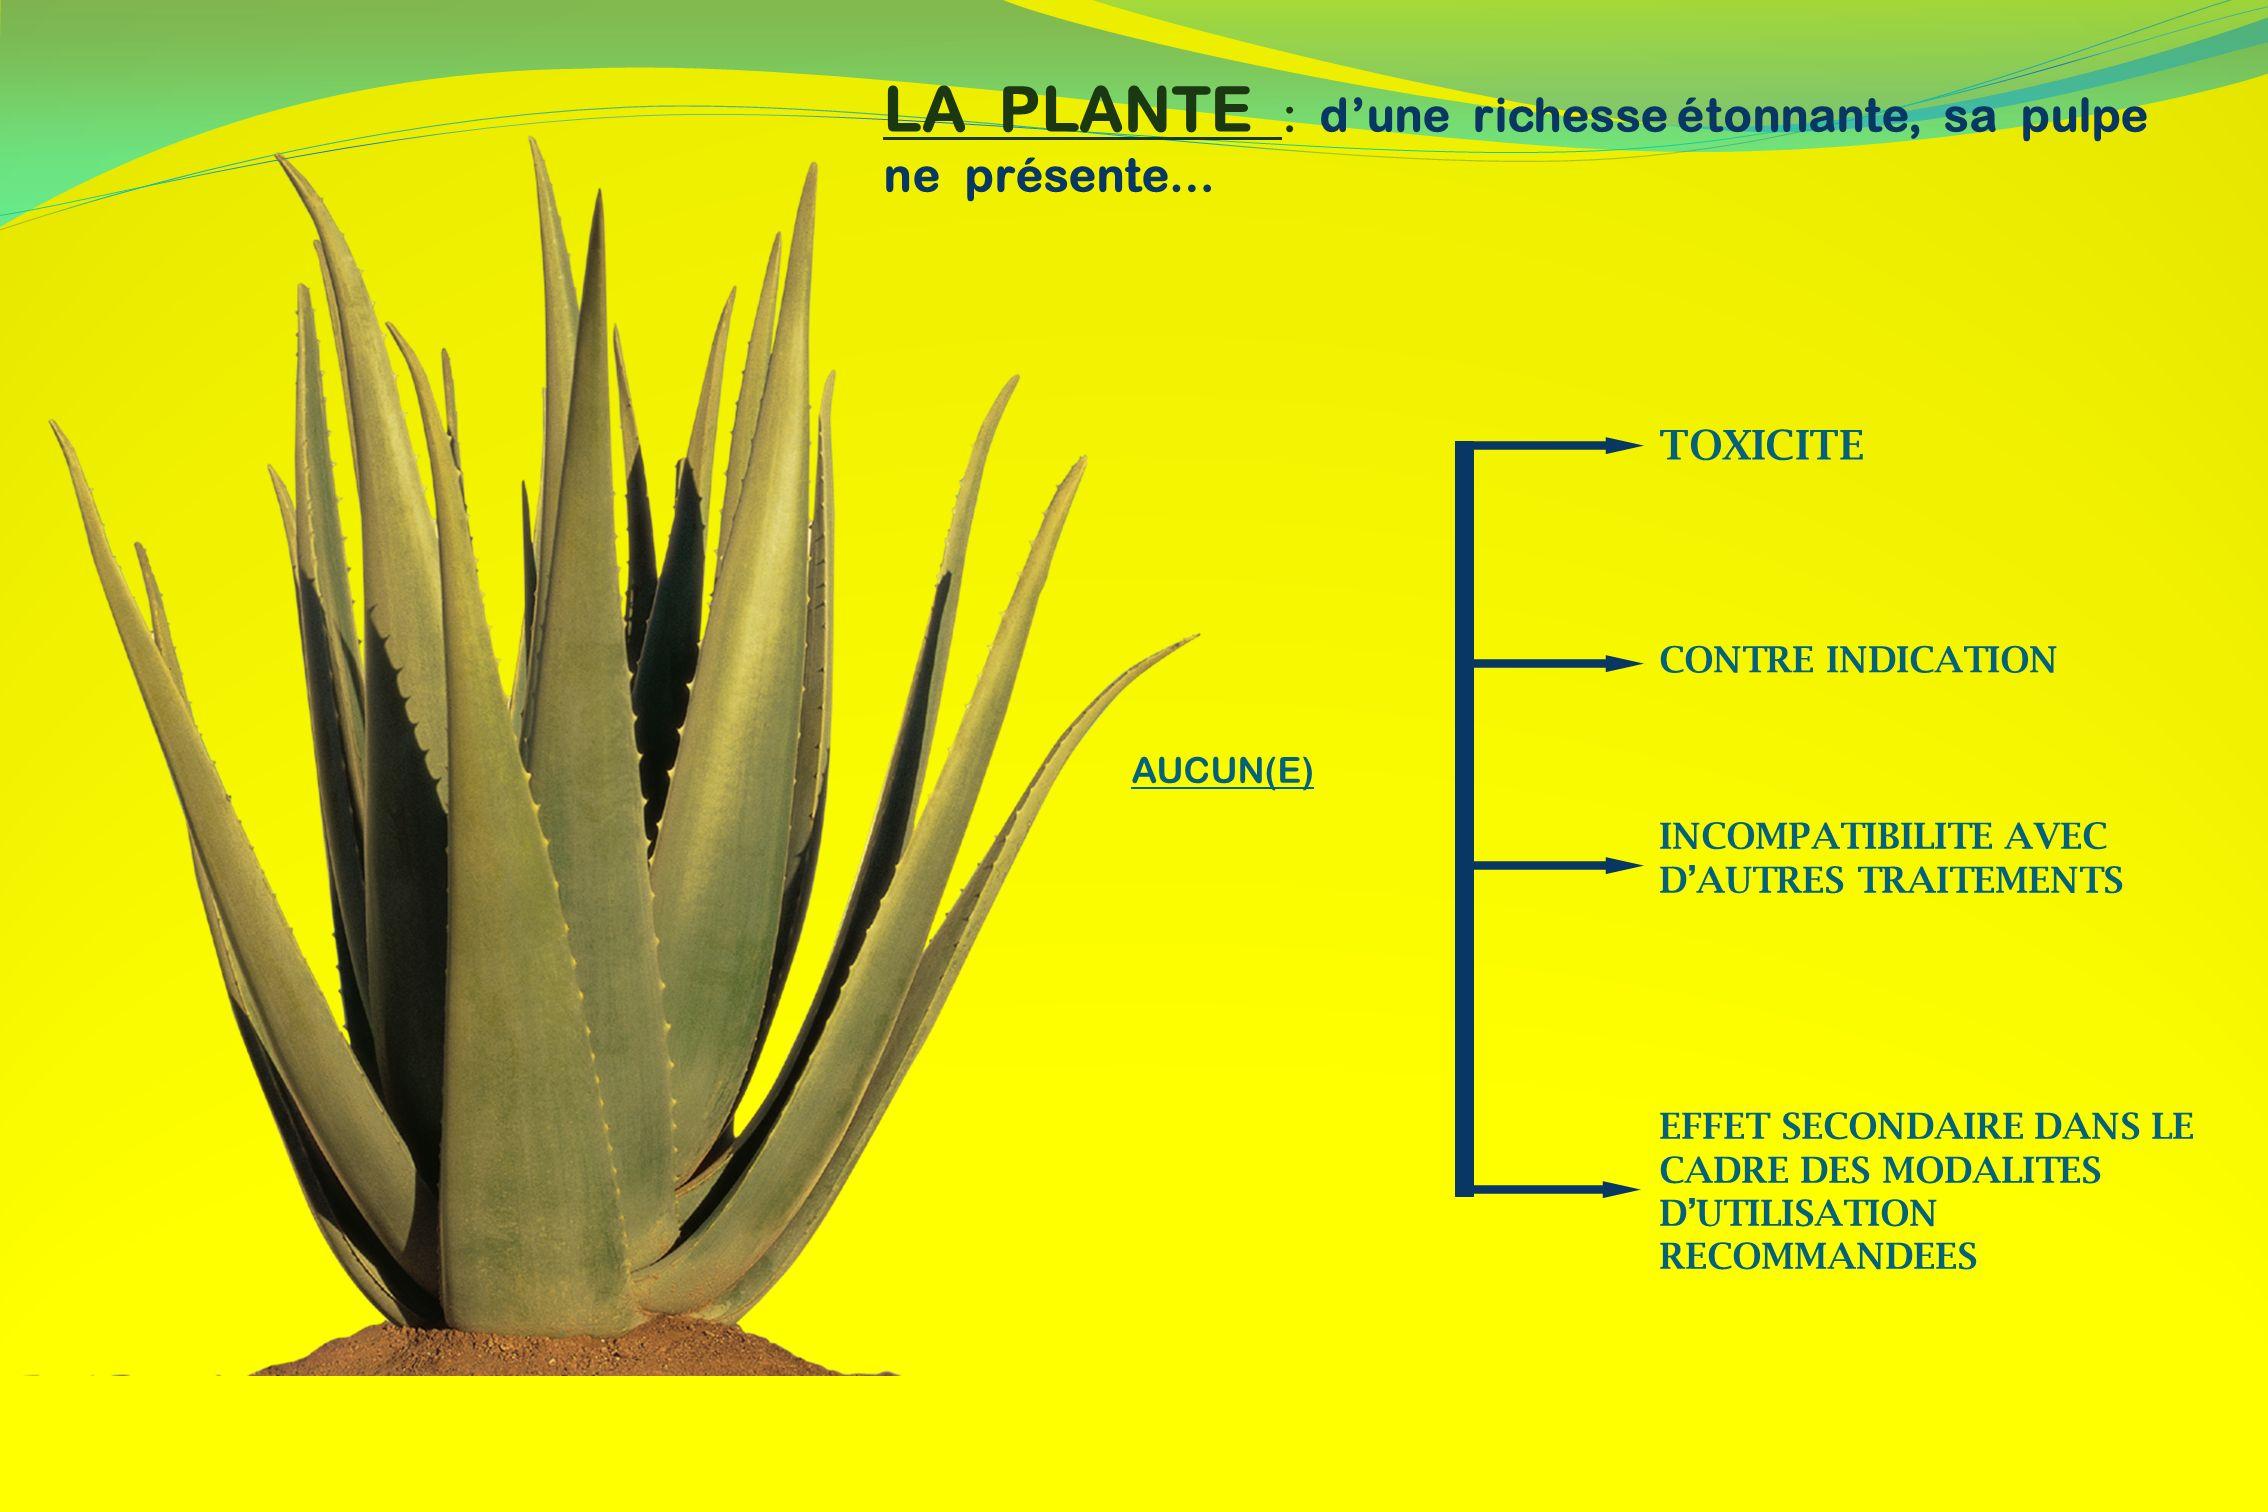 La feuille fraîche de lAloé Vera contient essentiellement : Des Vitamines : A, B1, B2, B3, B6, B9, B12, C, E,…..